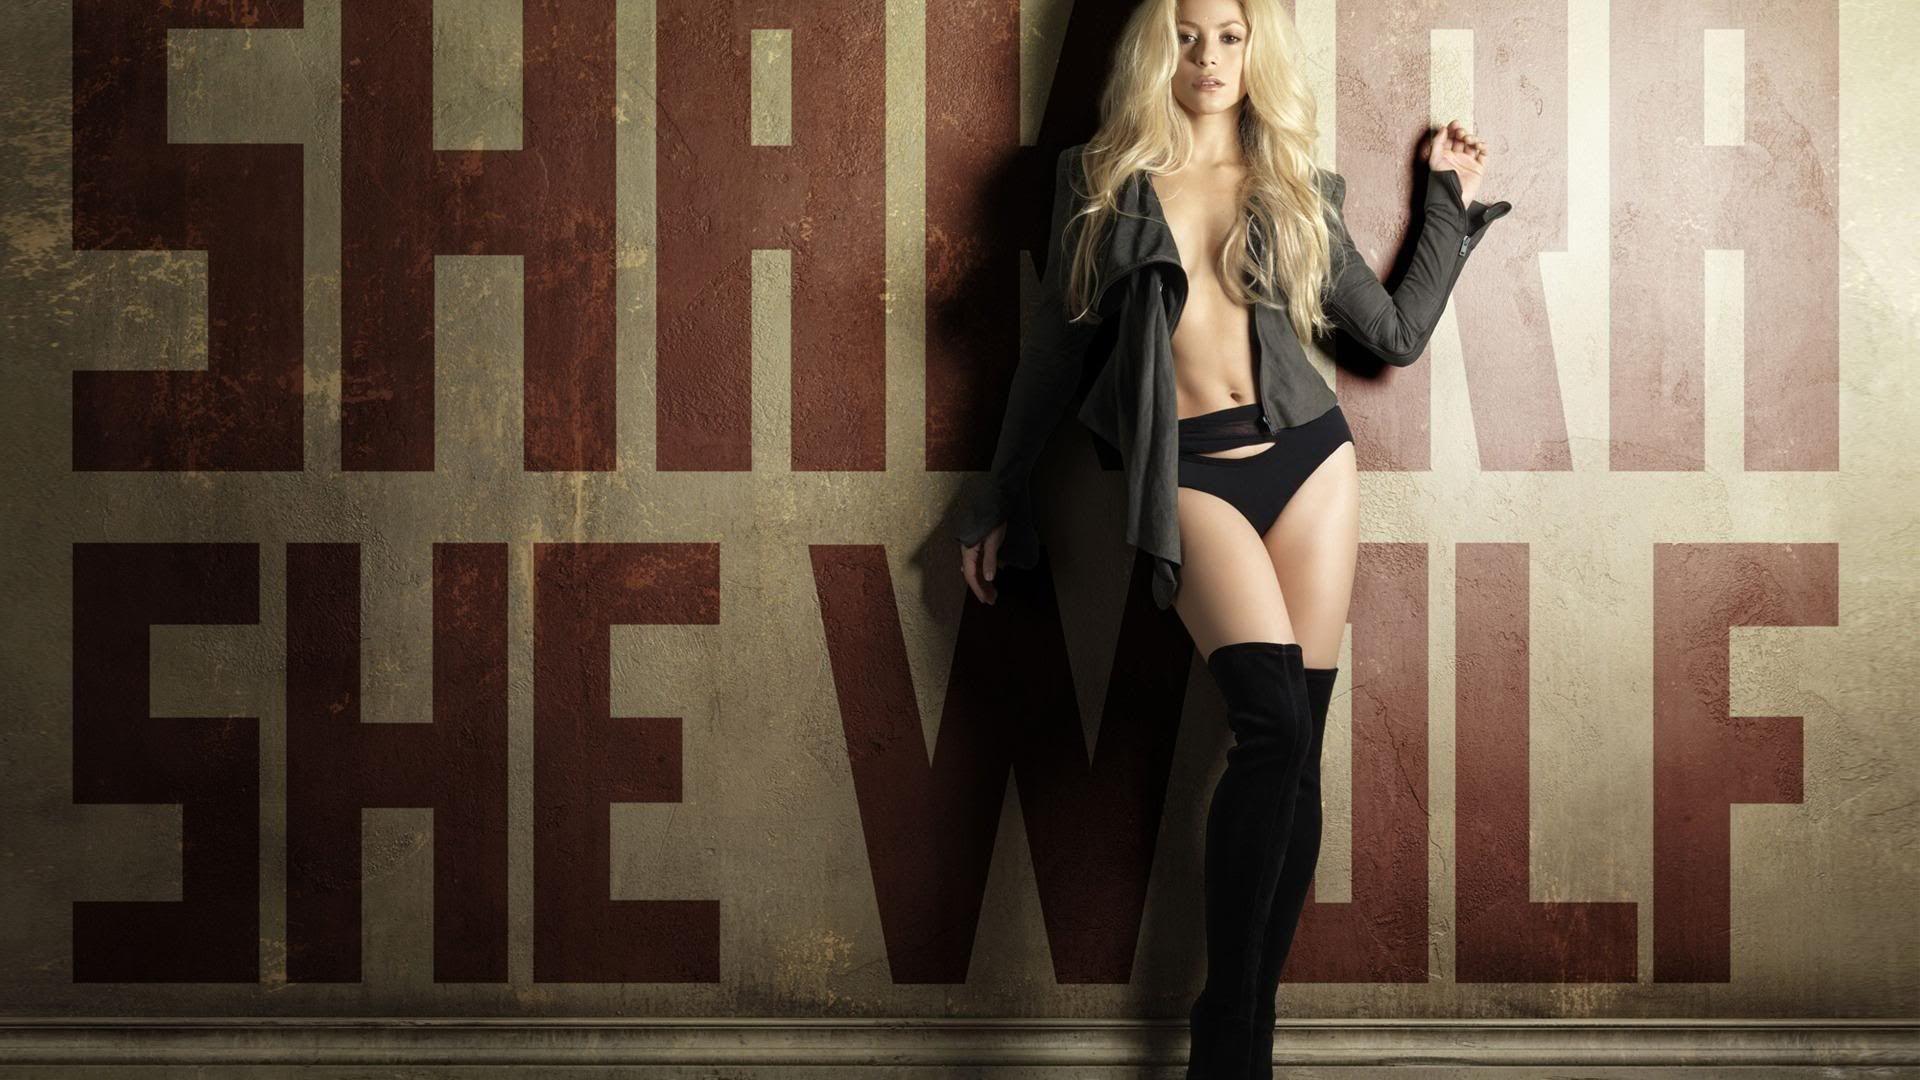 HD Wallpapers Mania Shakira She Wolf Wallpaper 1920x1080